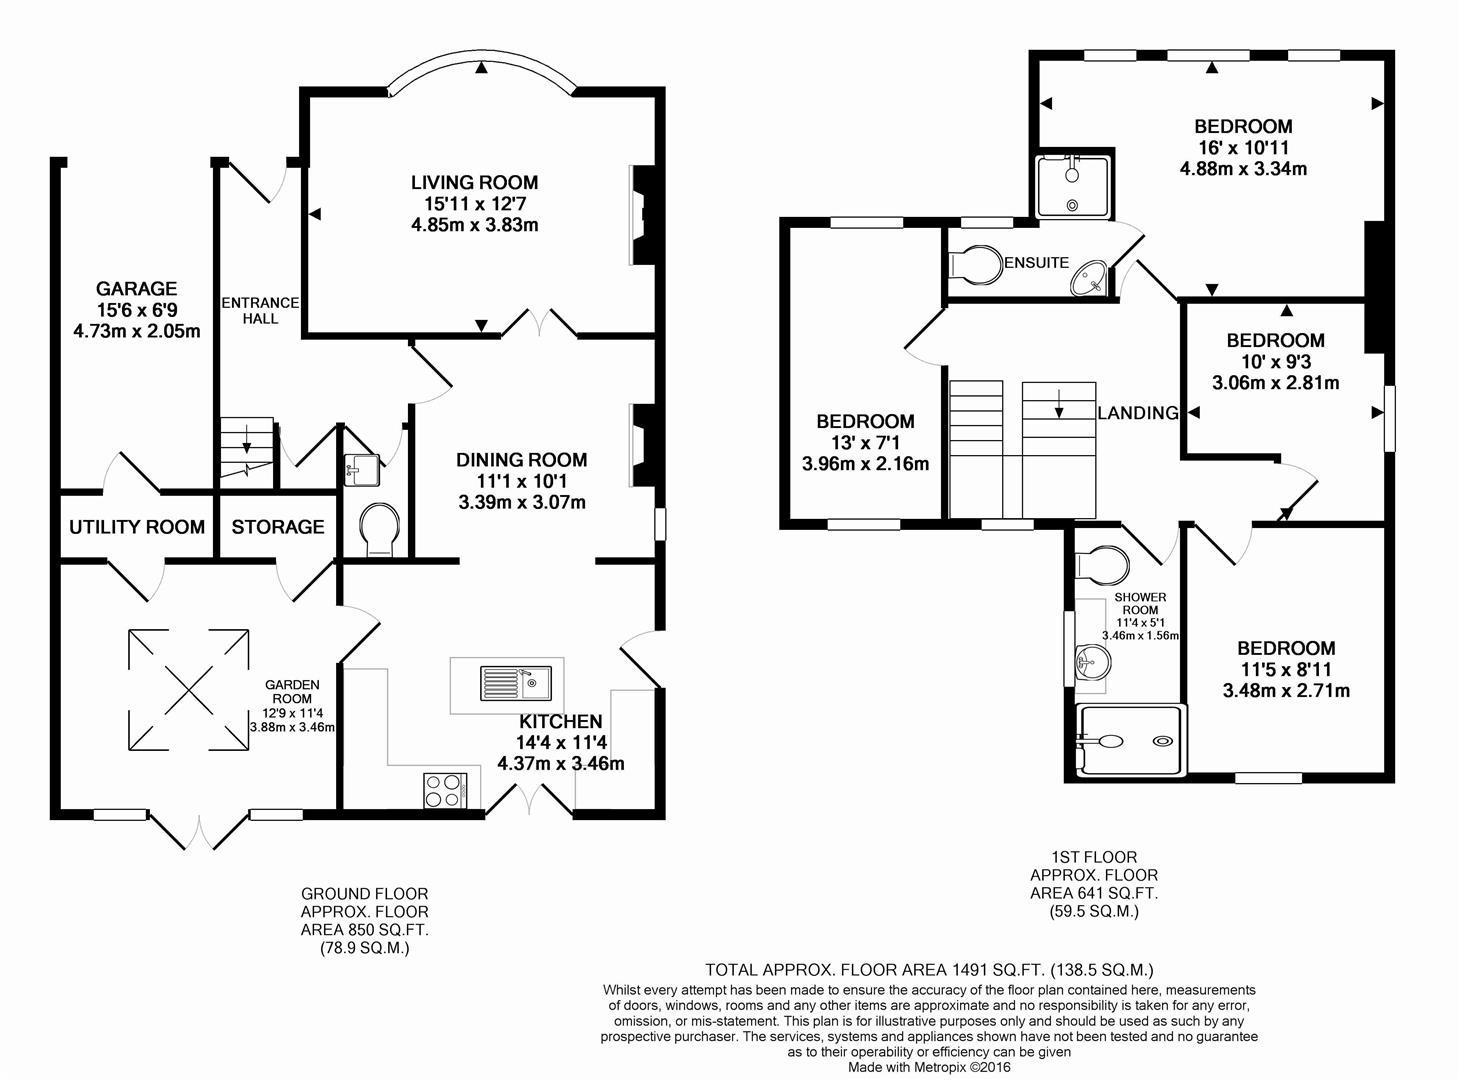 Dunston lane newbold chesterfield s41 4 bedroom for 16 brookers lane floor plans